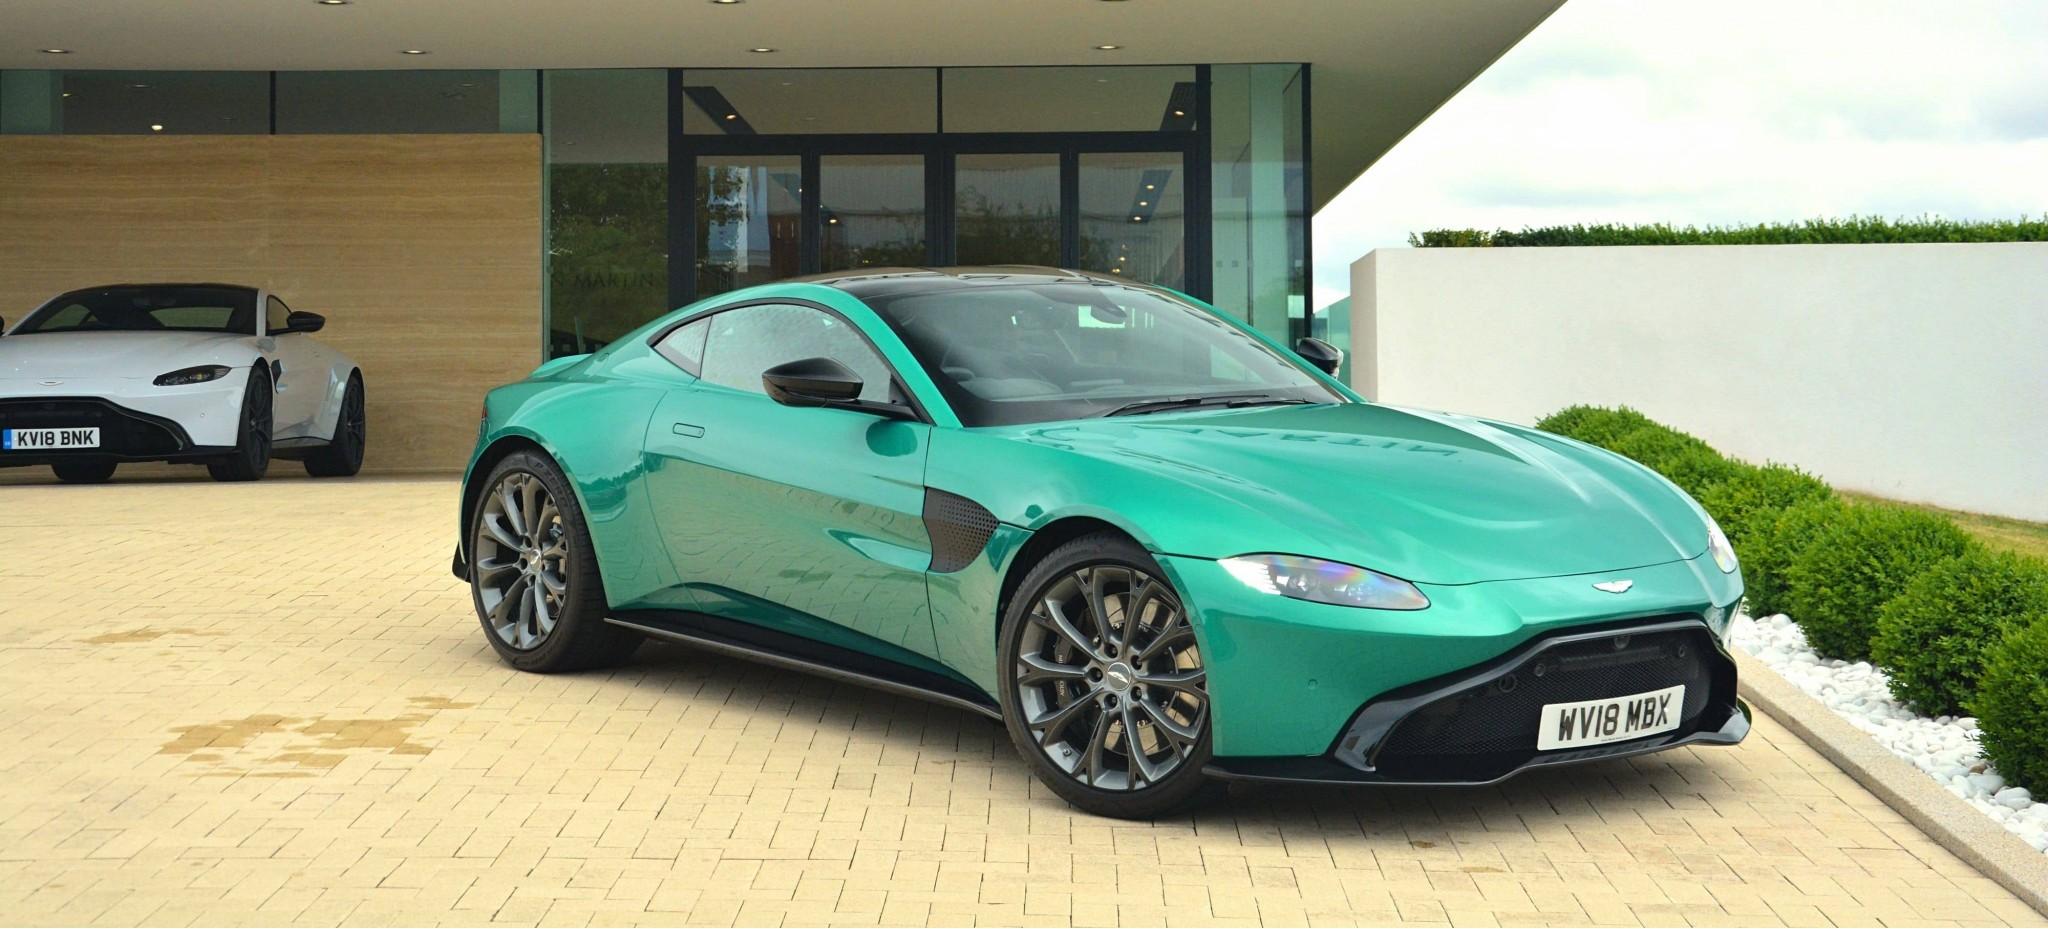 Aston Martin Bristol Has The Aston Martin Vantage 4 0 V8 Twin Turbo Waiting For You